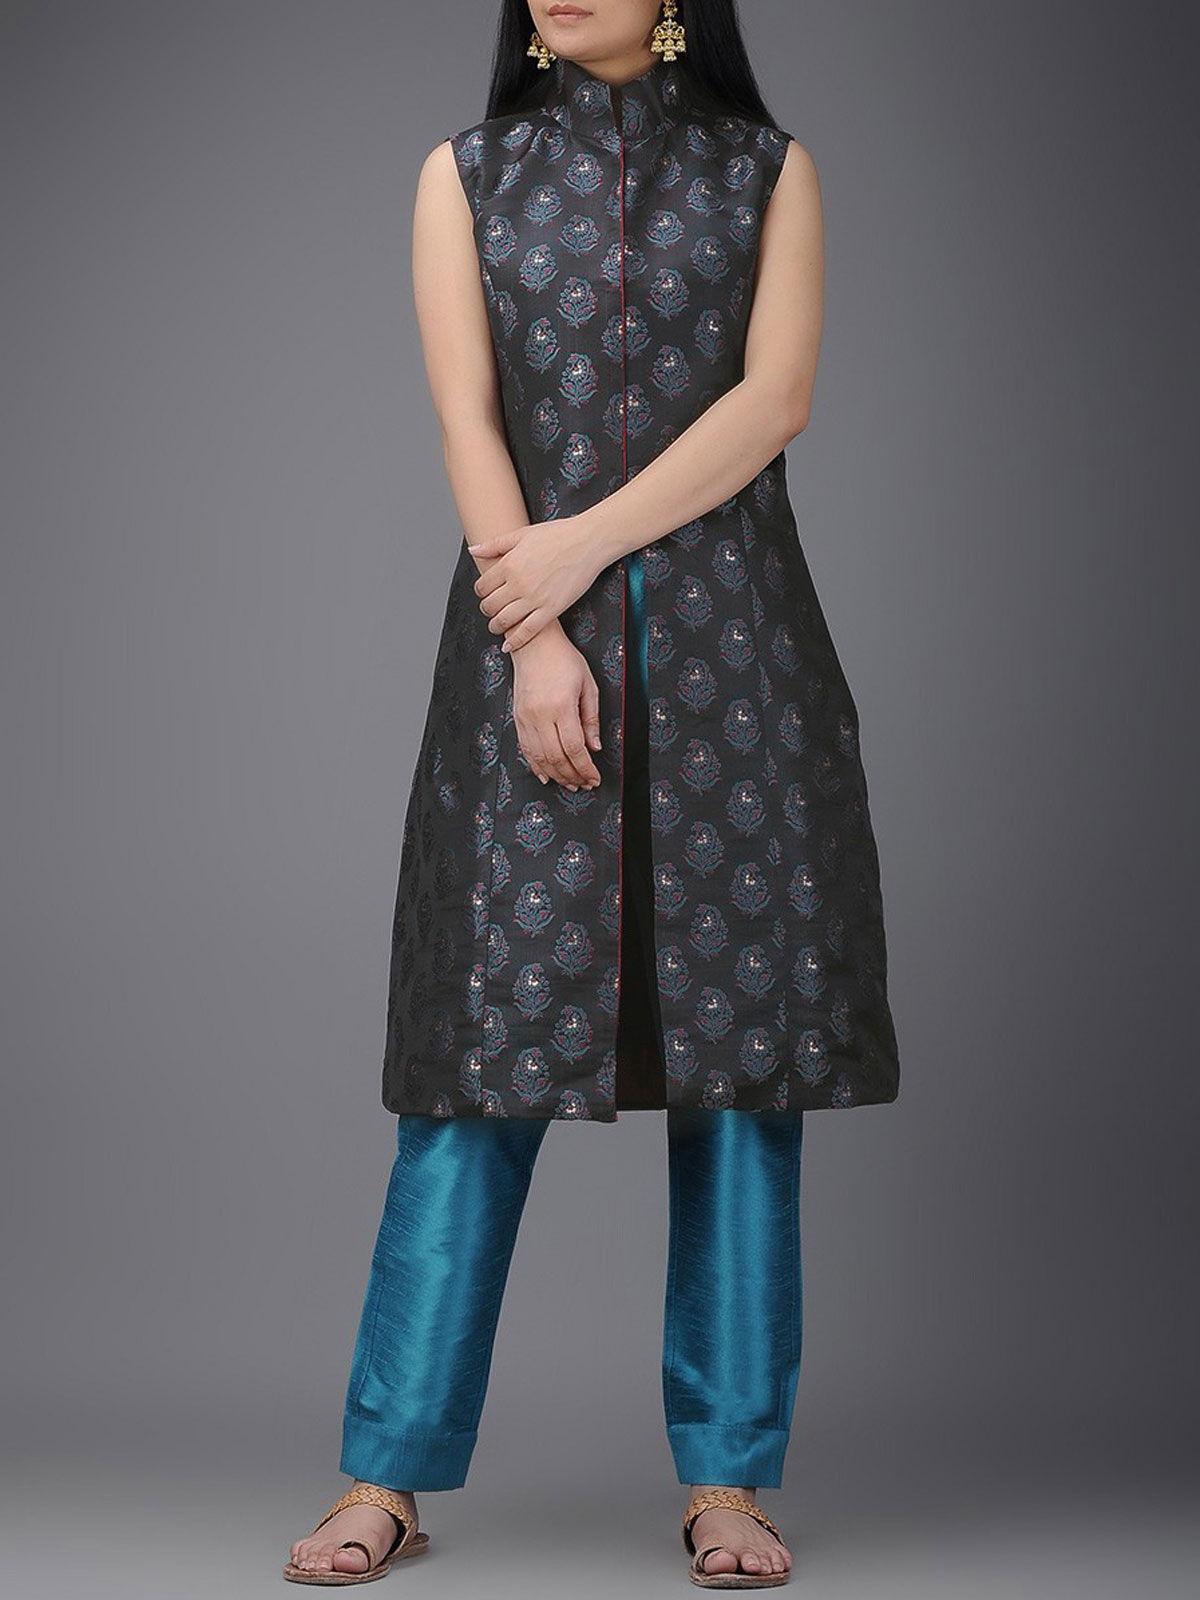 Black tanchoi silk high collar jacket